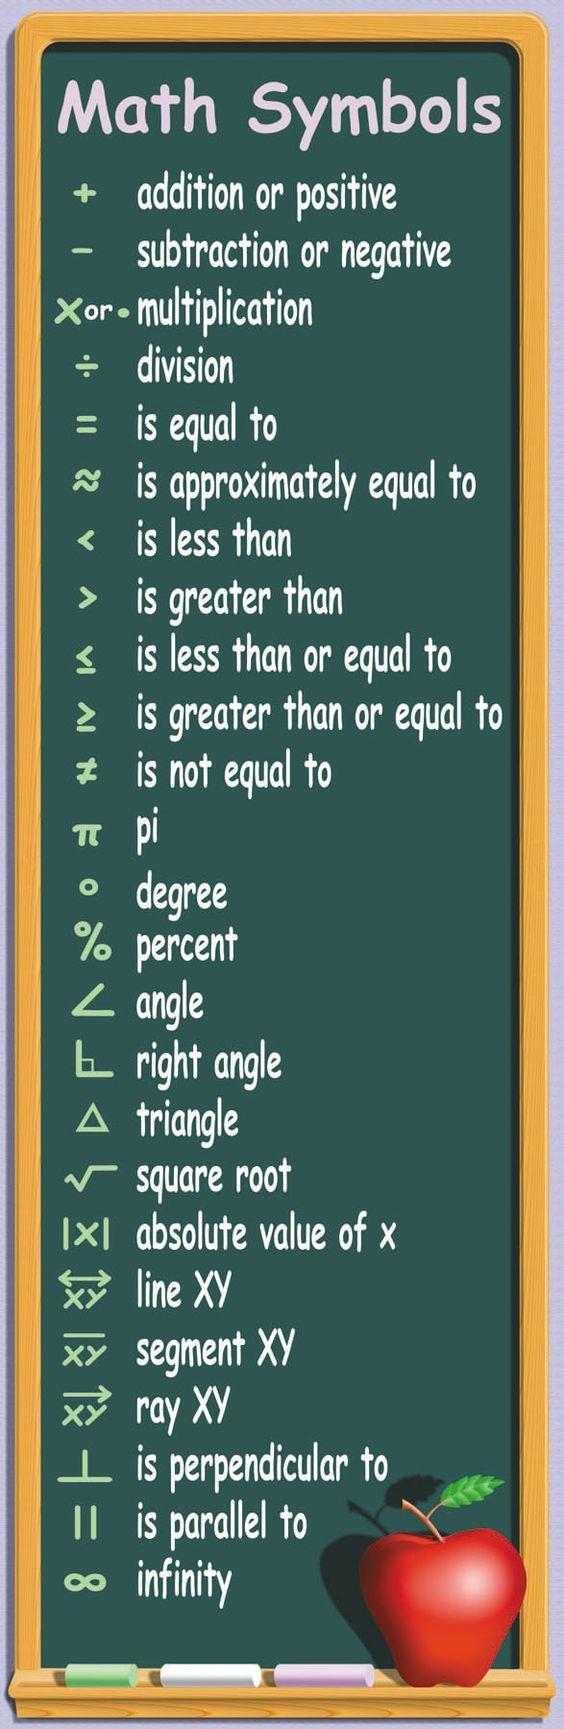 Forum | ________ Learn English | Fluent LandMath Symbols ...